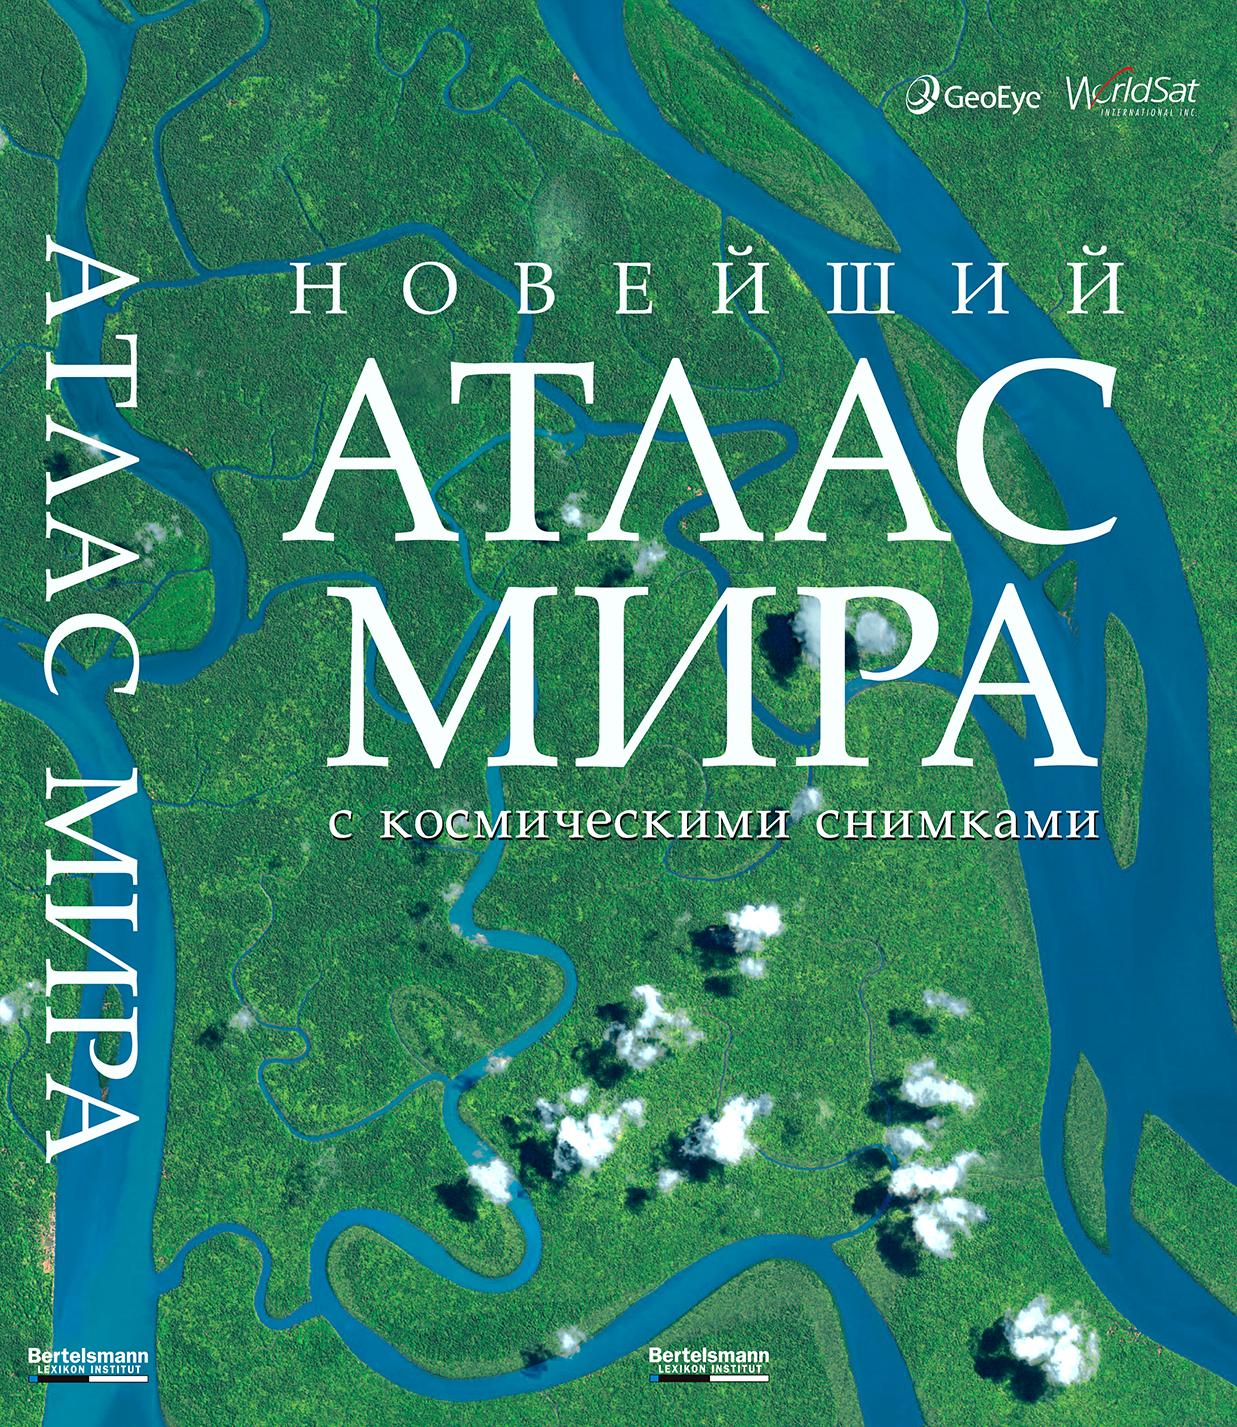 Atlantica_RussianSml